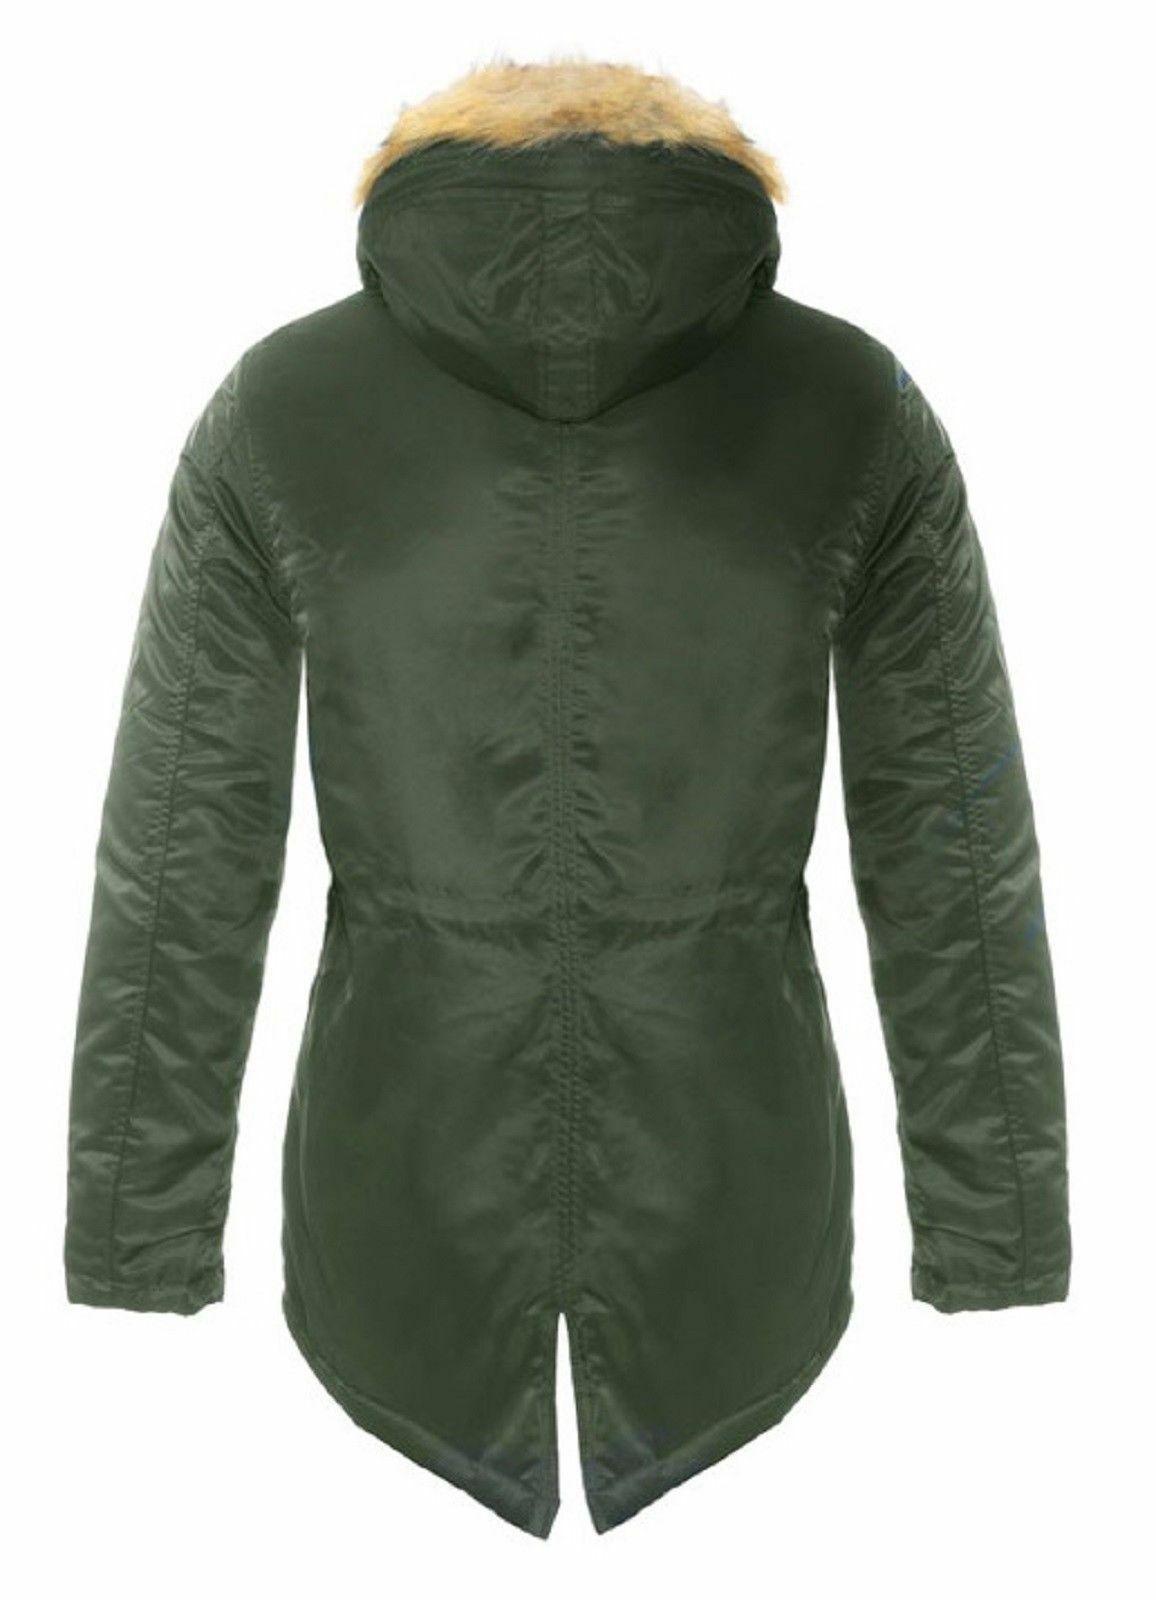 Parka-Uomo-Invernale-Giubbotto-Canadian-Pelliccia-Cappuccio-Blu-Verde miniatura 14